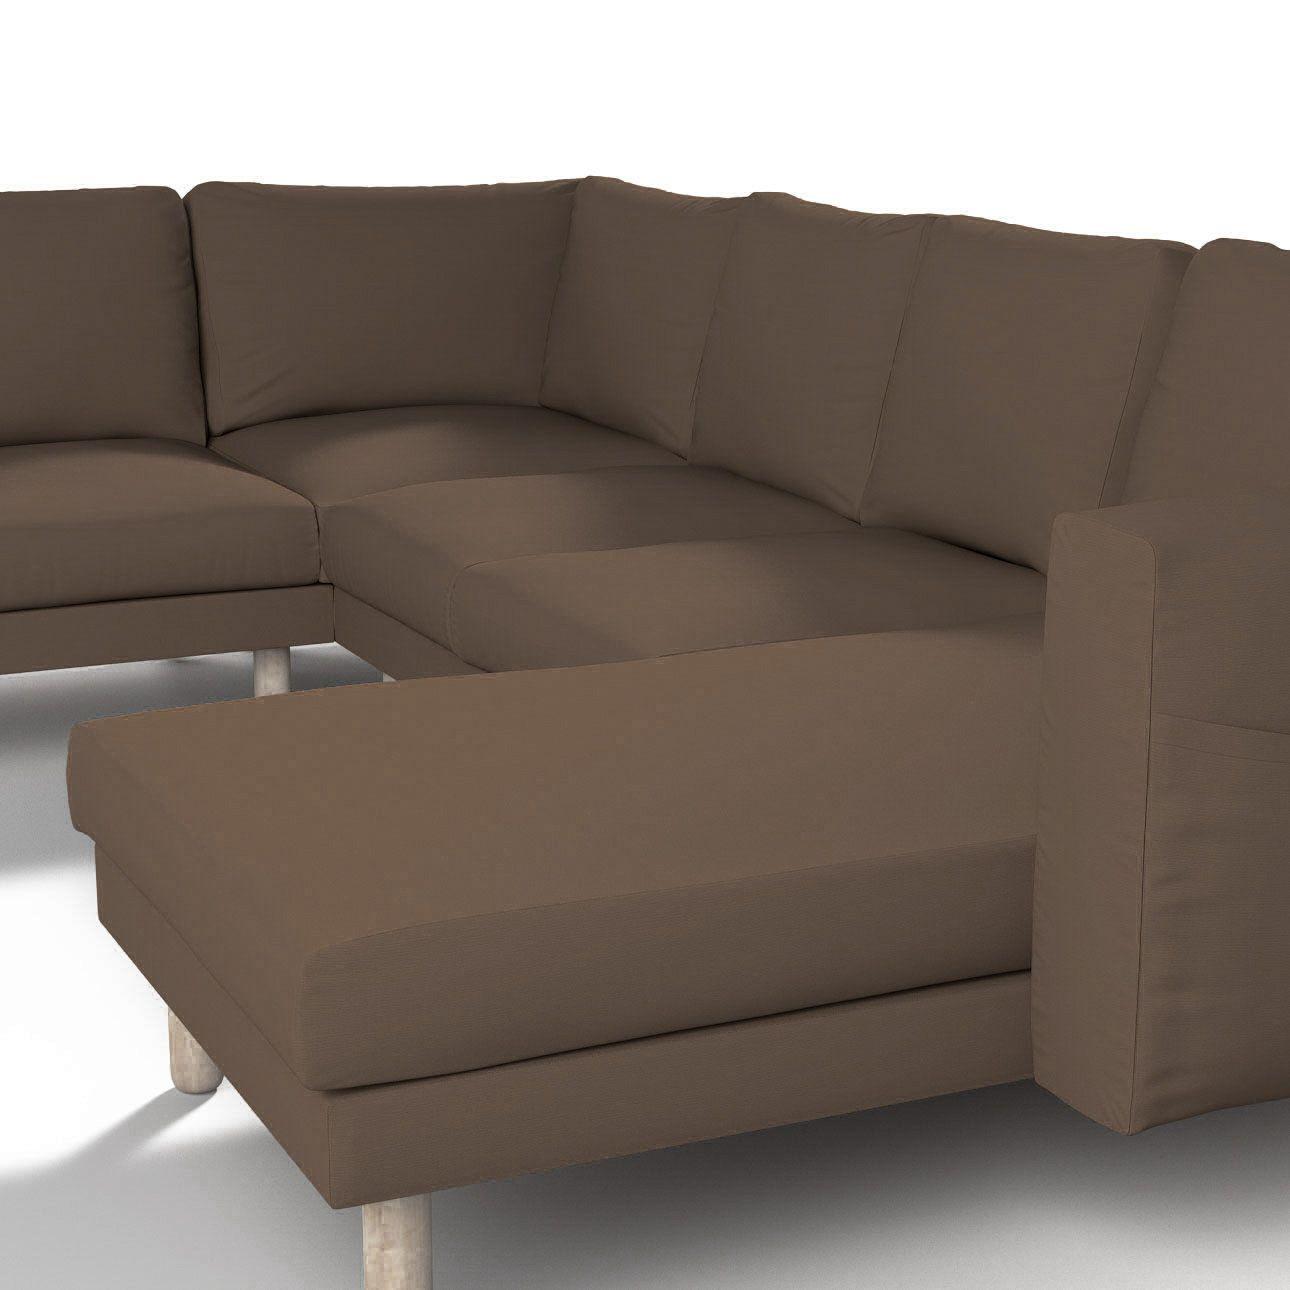 Full Size of Sofa Bezug Ecksofa Grau Mit Ottomane Rechts U Form Otto Amazon Links Ikea P35227 Weißes Schlafsofa Liegefläche 160x200 Lounge Garten 3 Sitzer Garnitur 2 Sofa Sofa Bezug Ecksofa